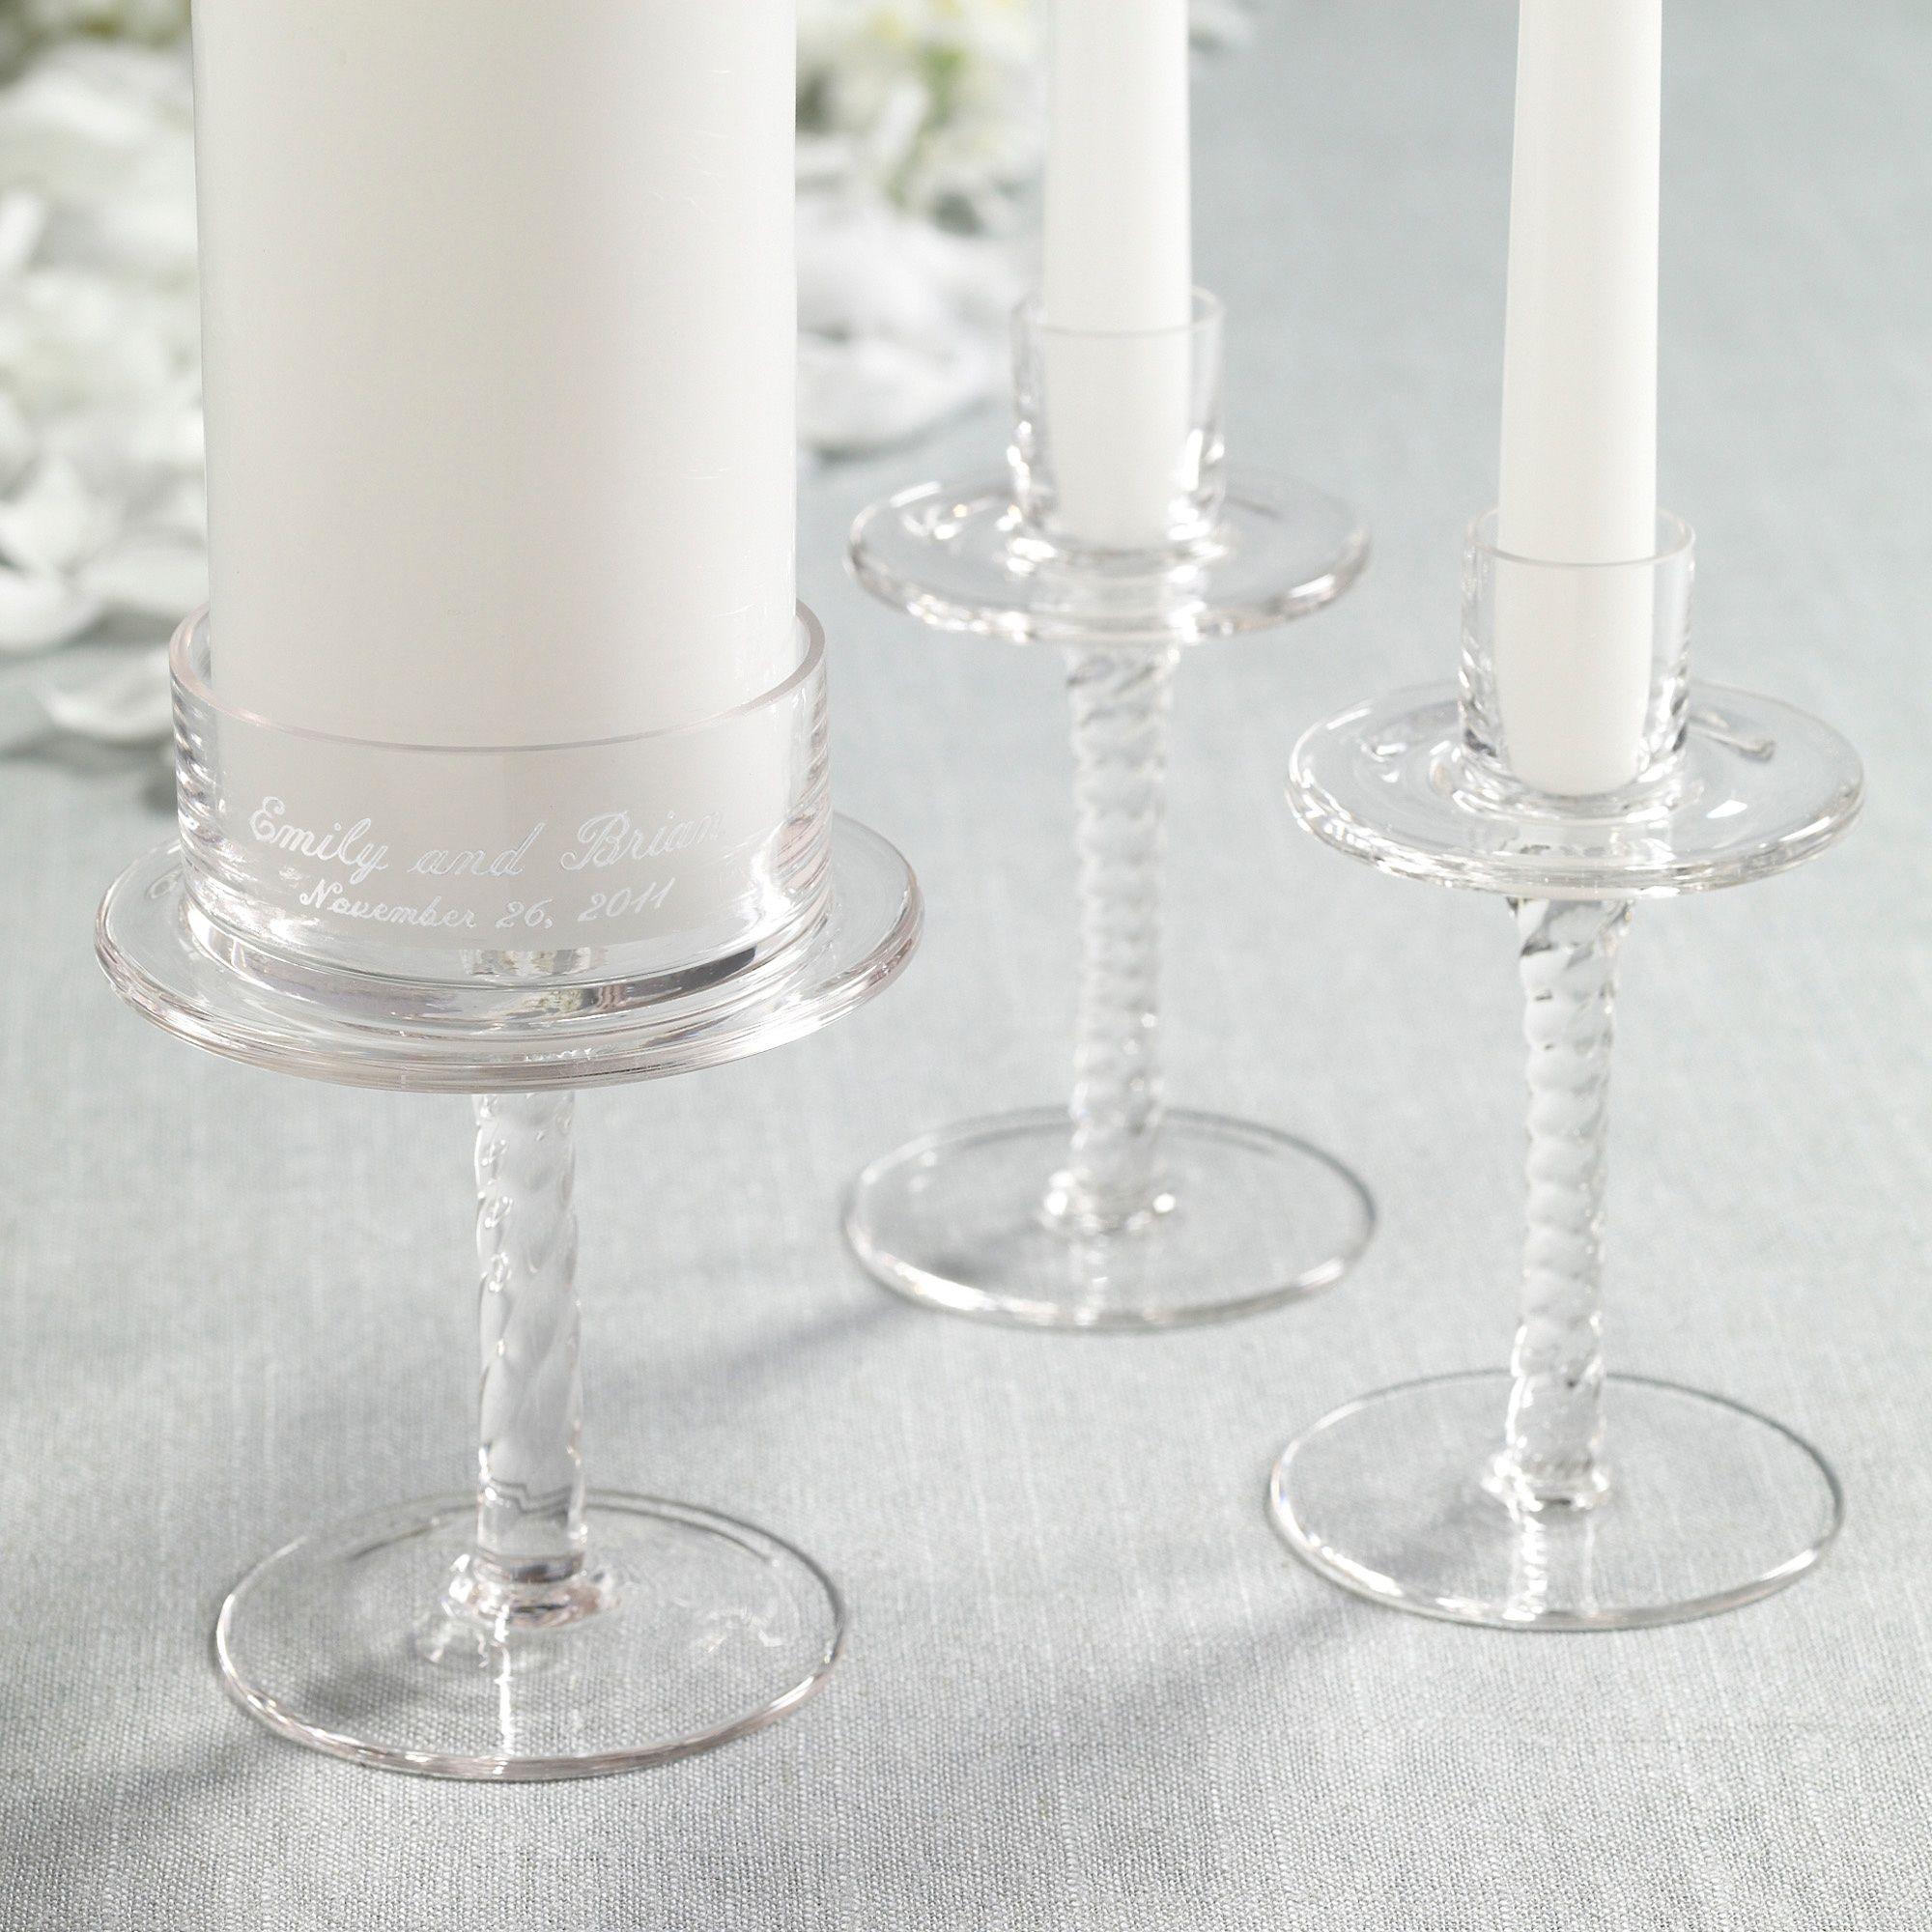 Personalized Glass Wedding Unity Candle Holders | #exclusivelyweddings